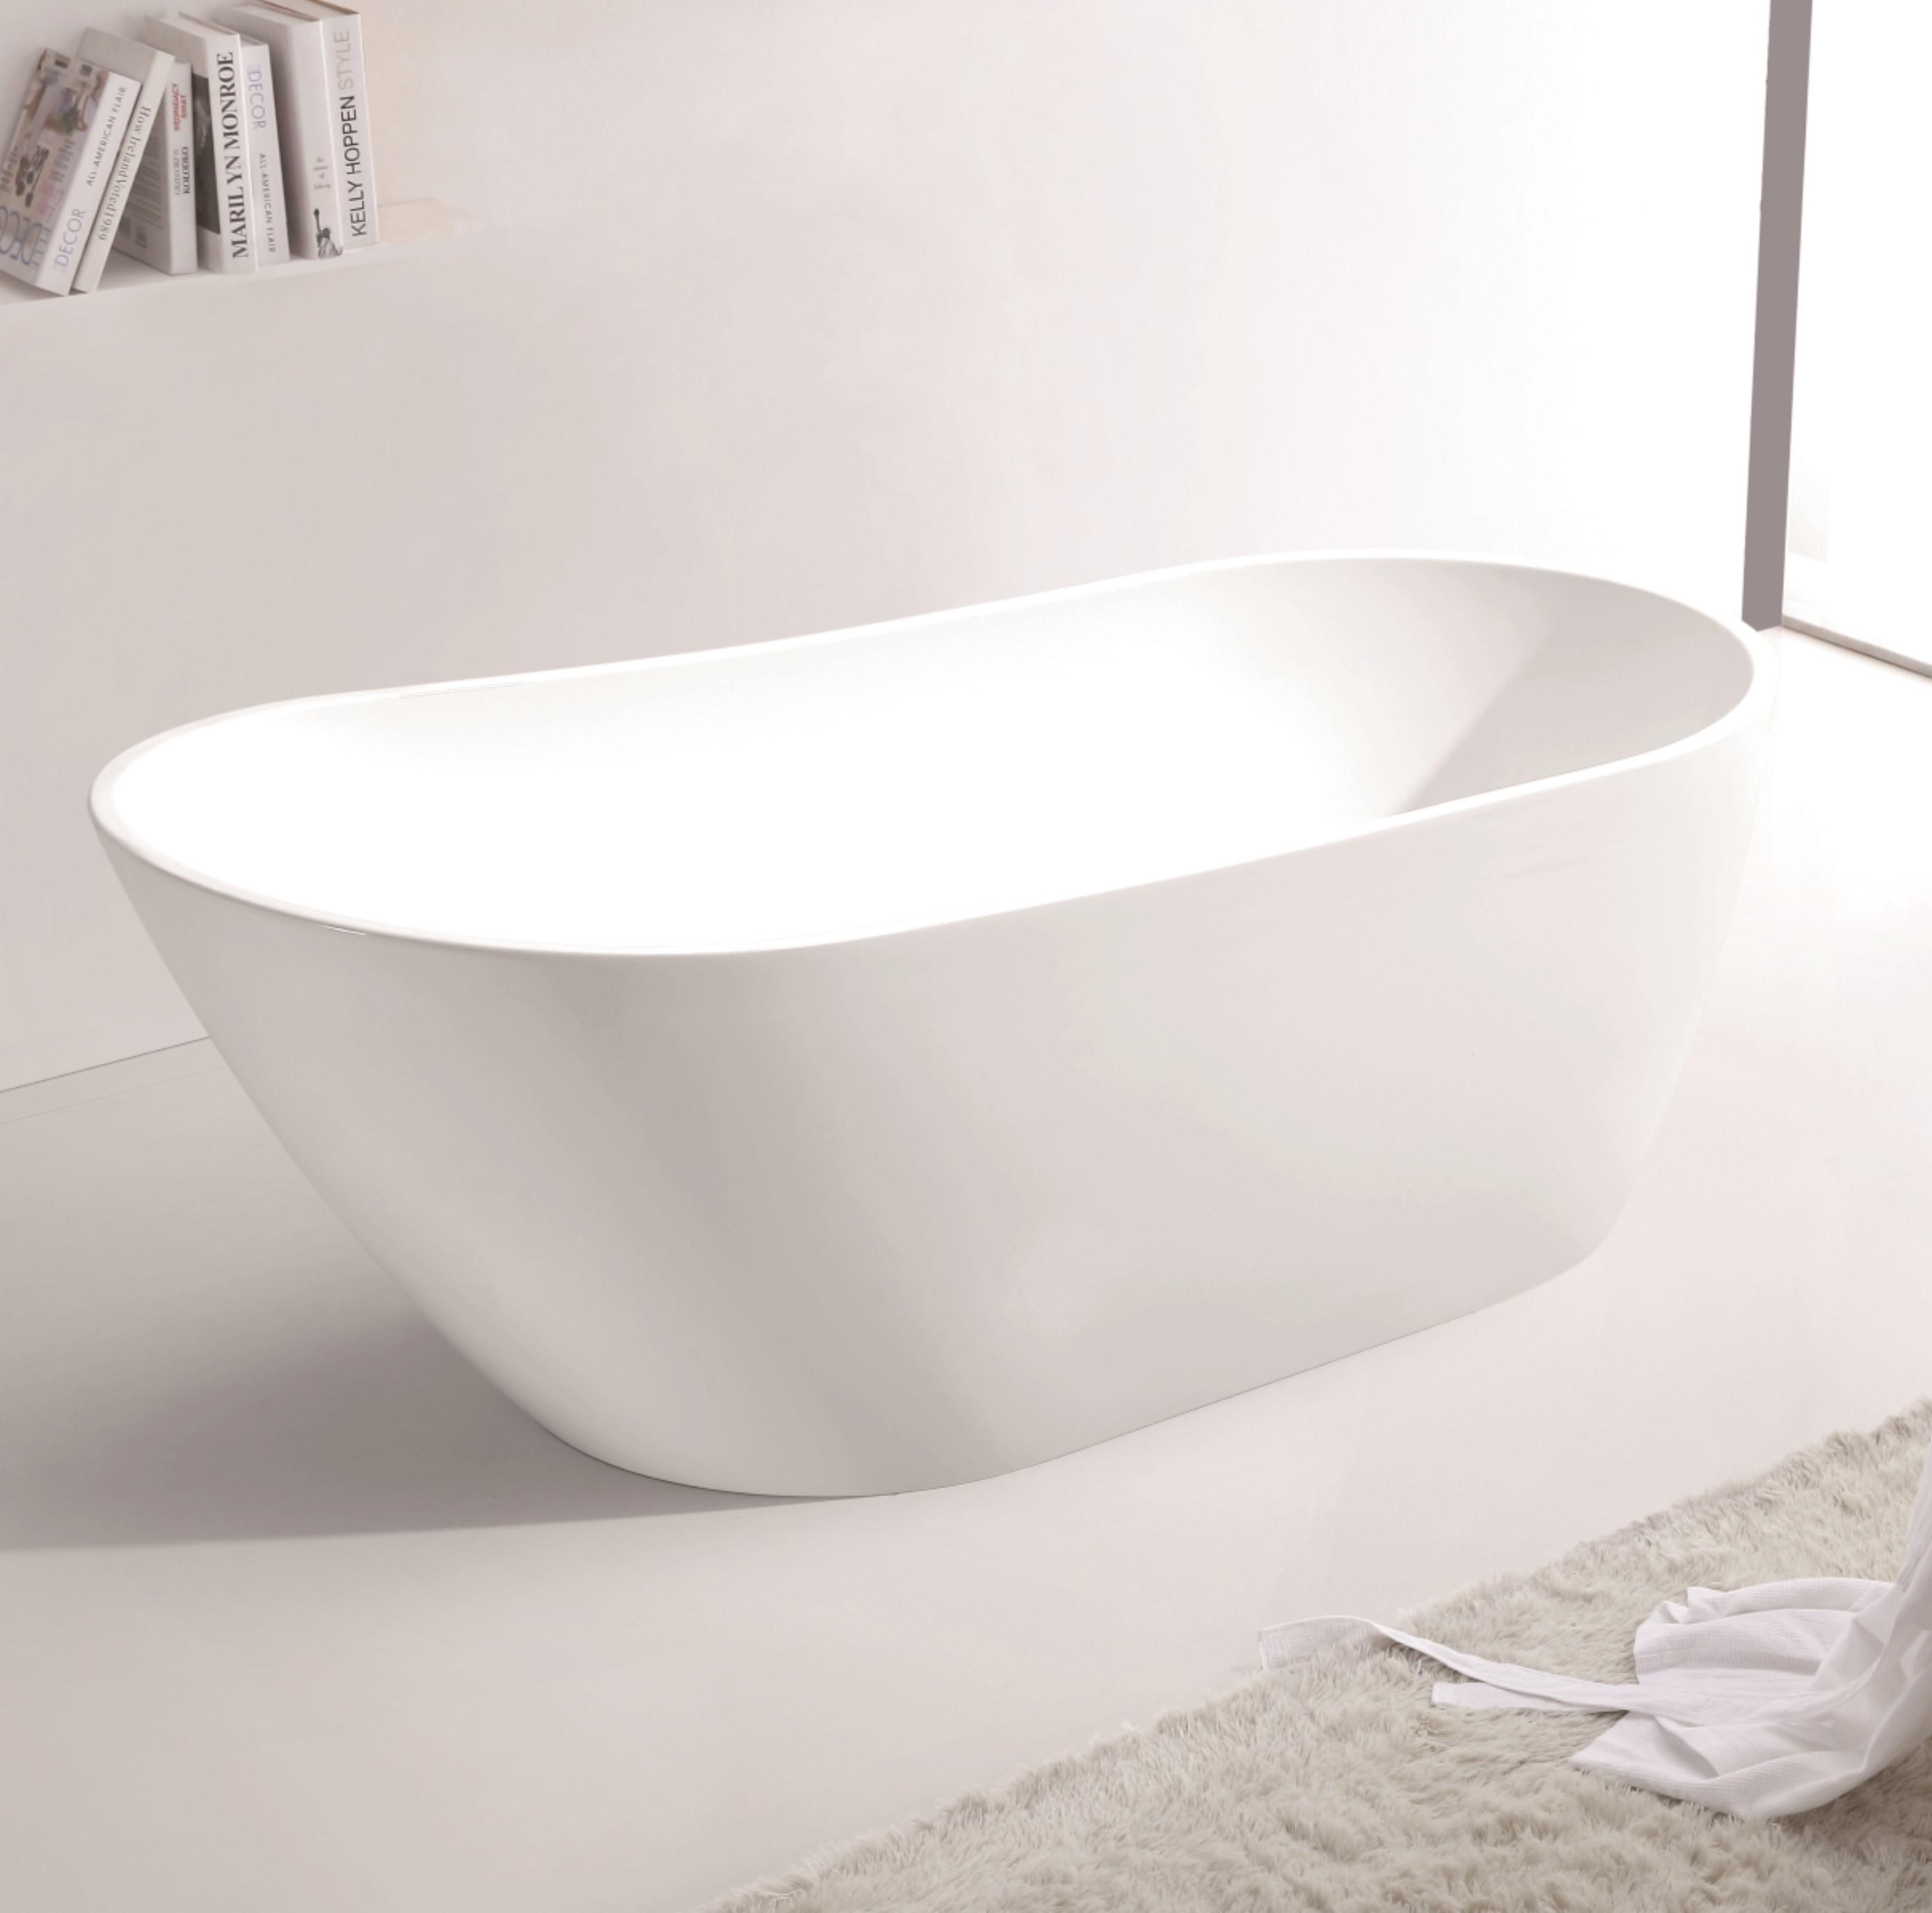 BT128-Free-Standing-Bathtub